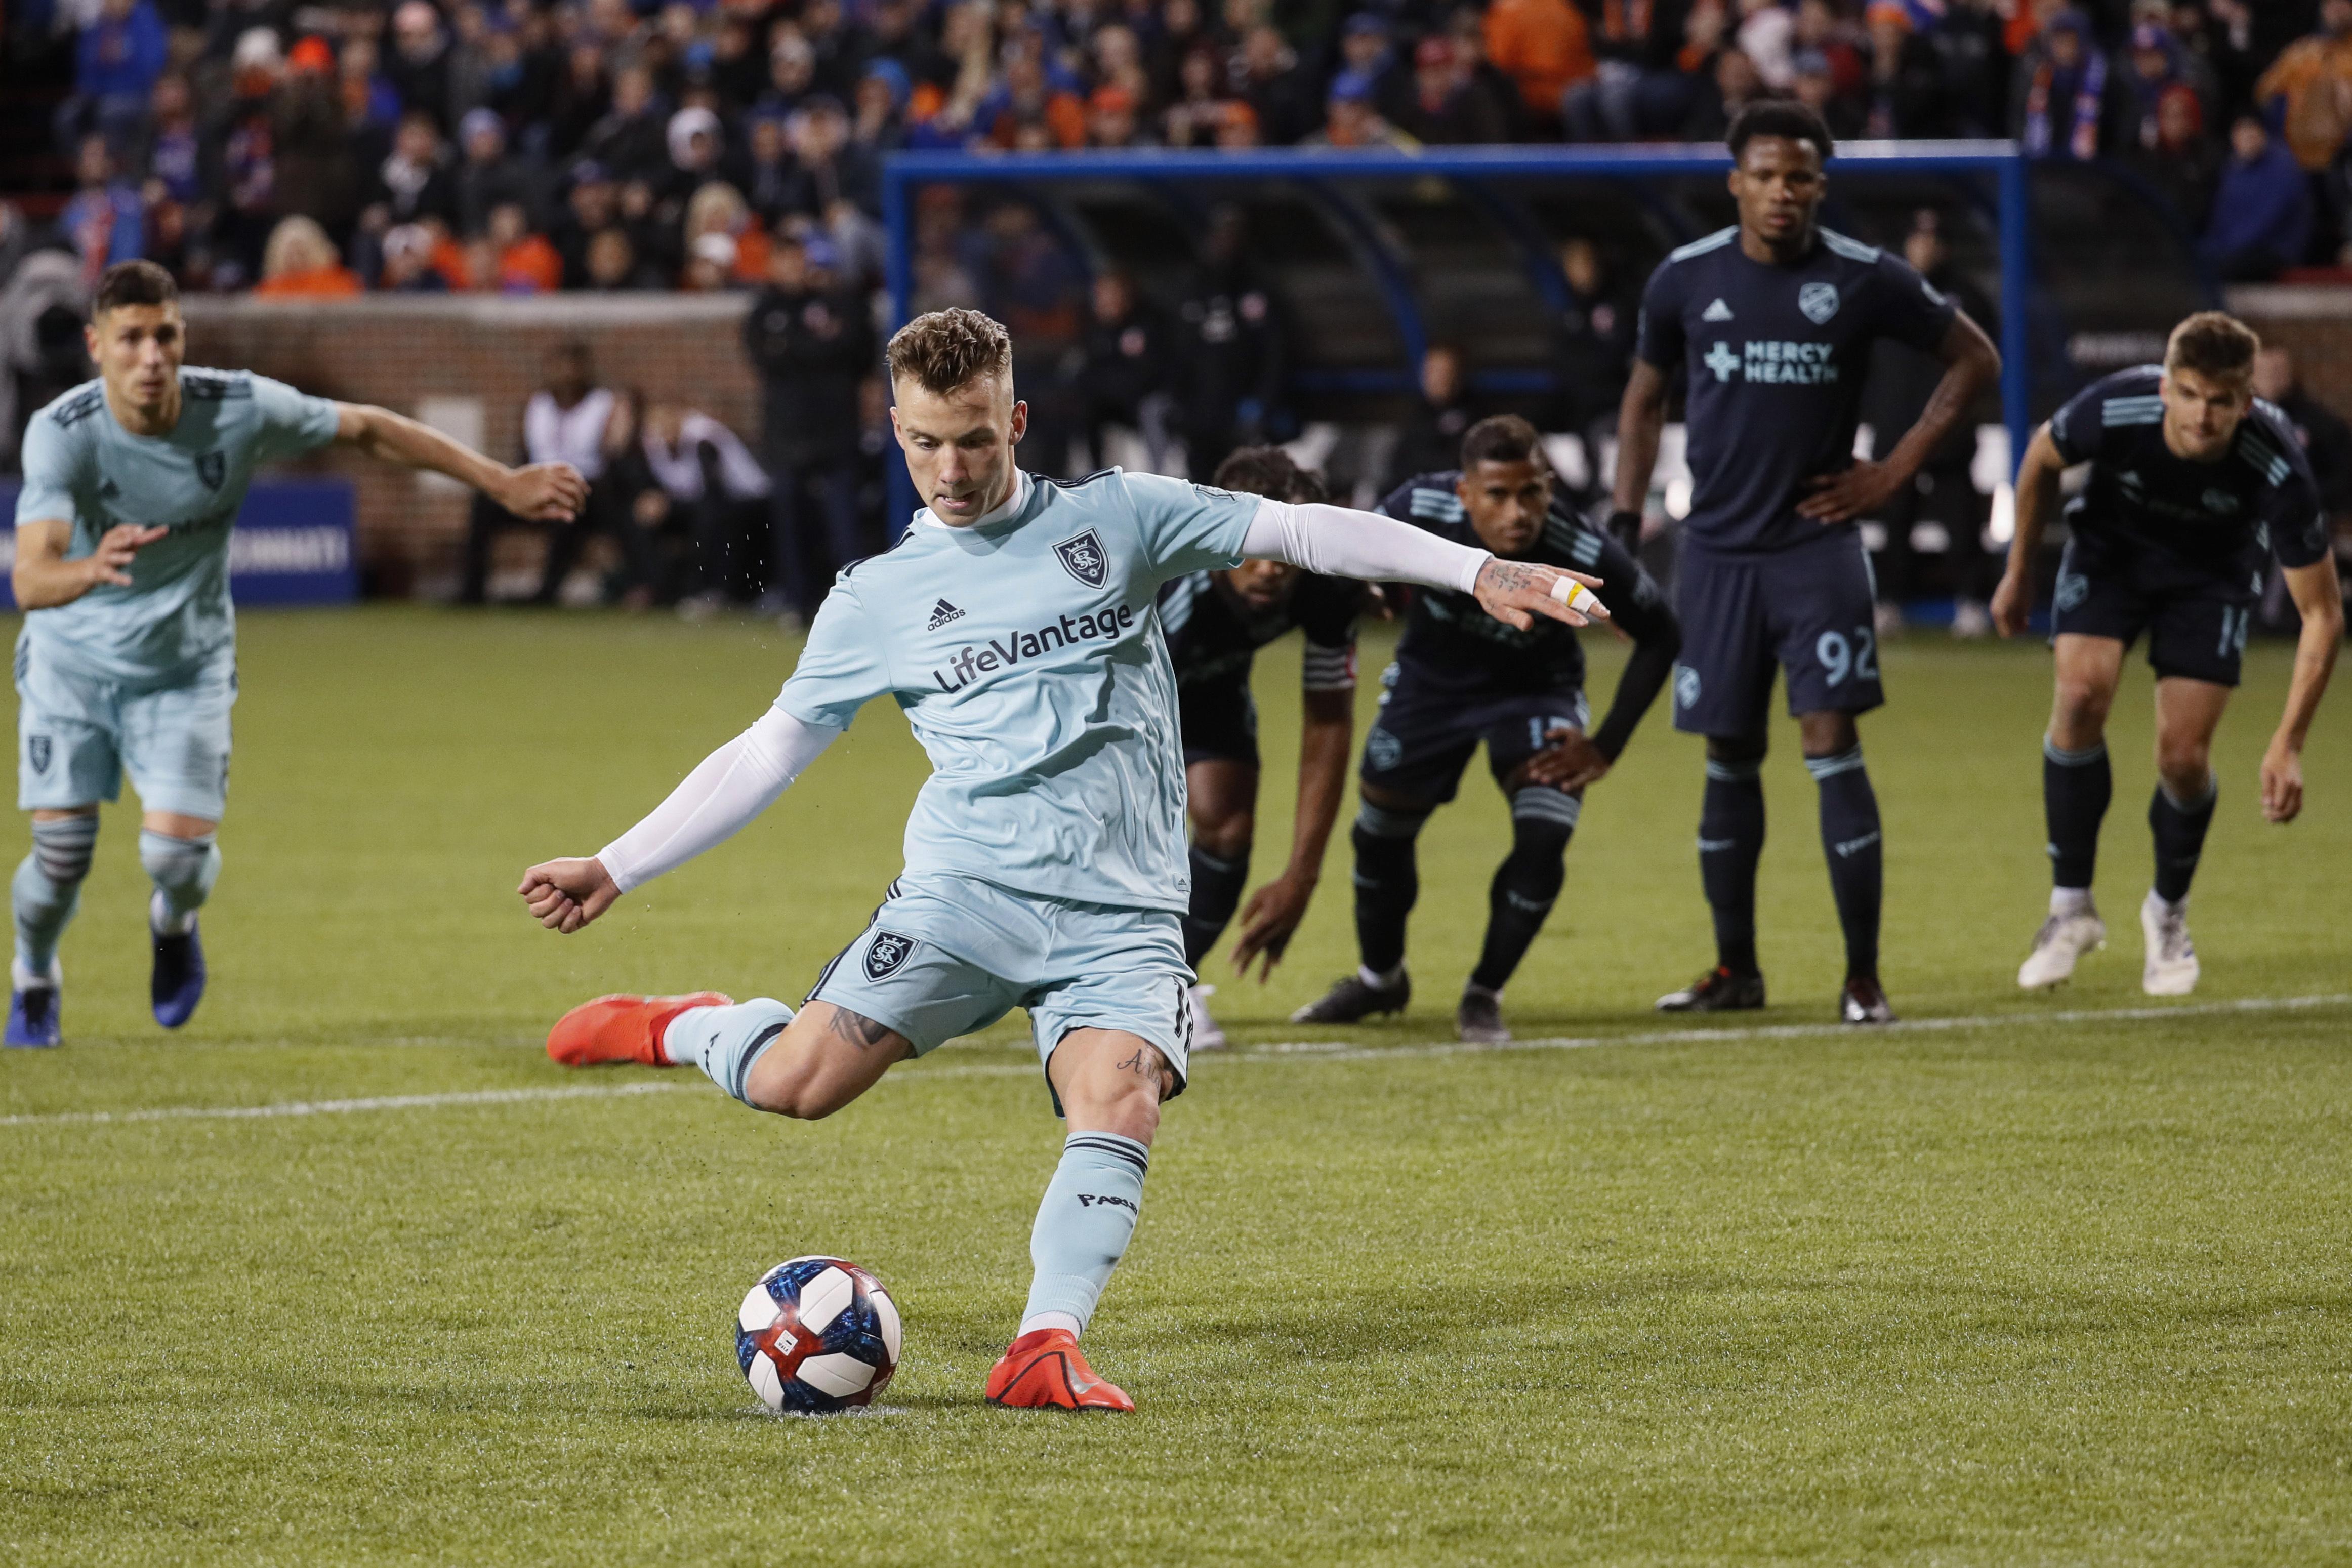 Real Salt Lake midfielder Albert Rusnak takes a penalty kick during the second half of the team's MLS soccer match against FC Cincinnati, Friday, April 19, 2019, in Cincinnati. (AP Photo/John Minchillo)